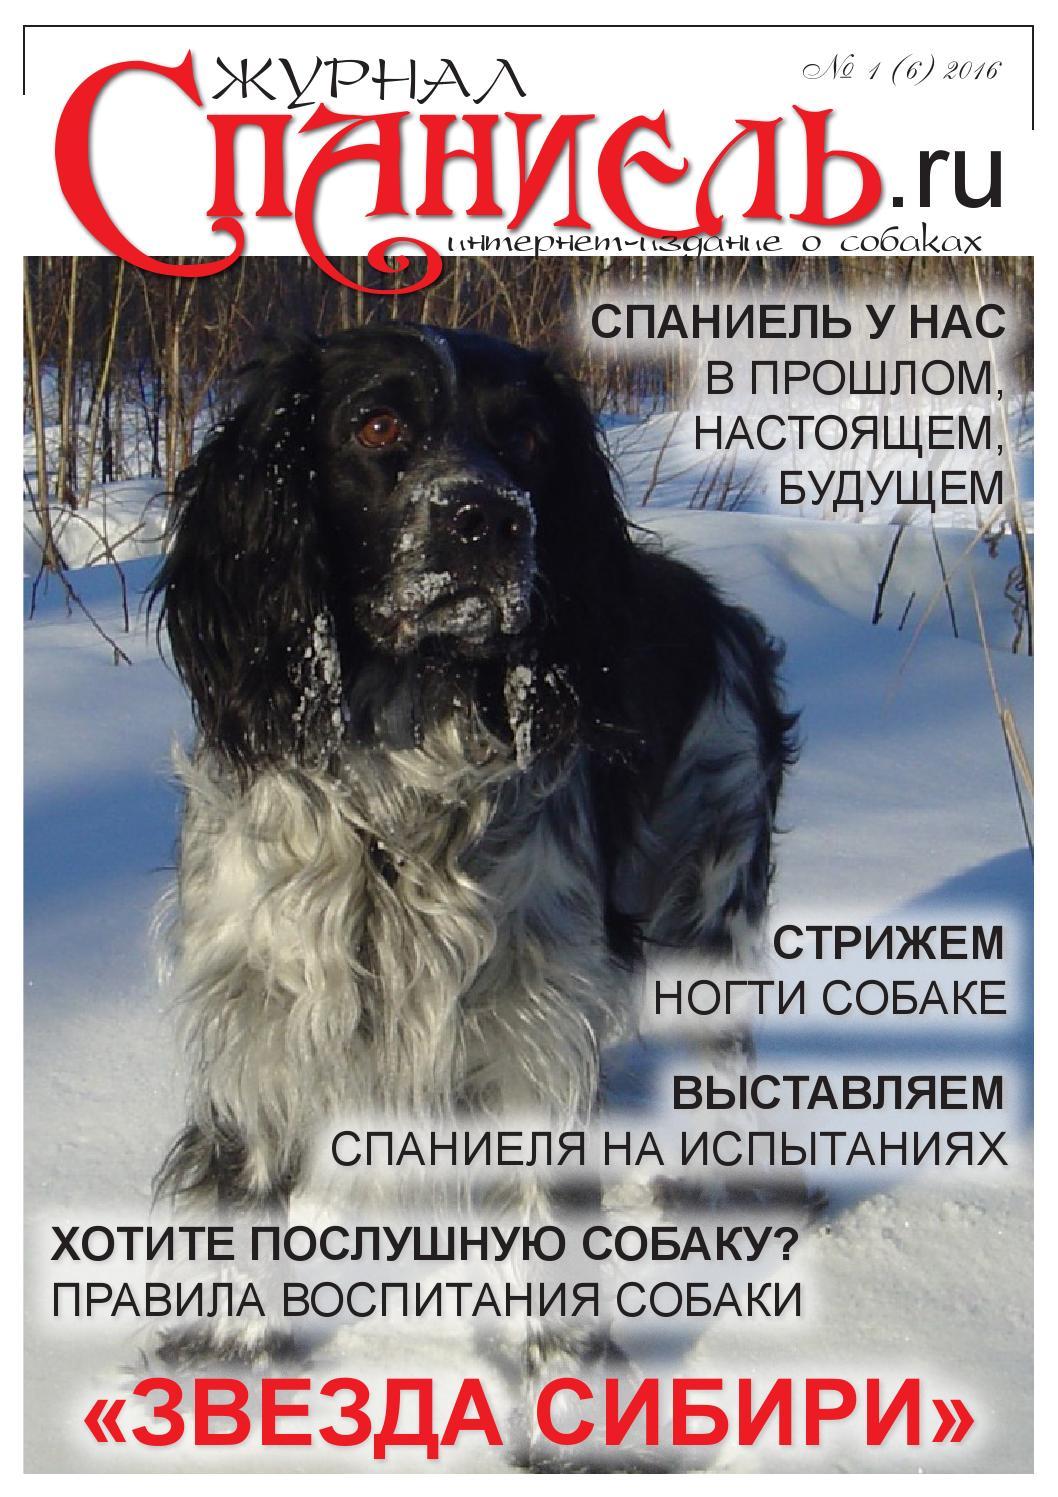 Компьютерная обработка: медведева т. Ю. Ерёмина е. Г. Pdf.